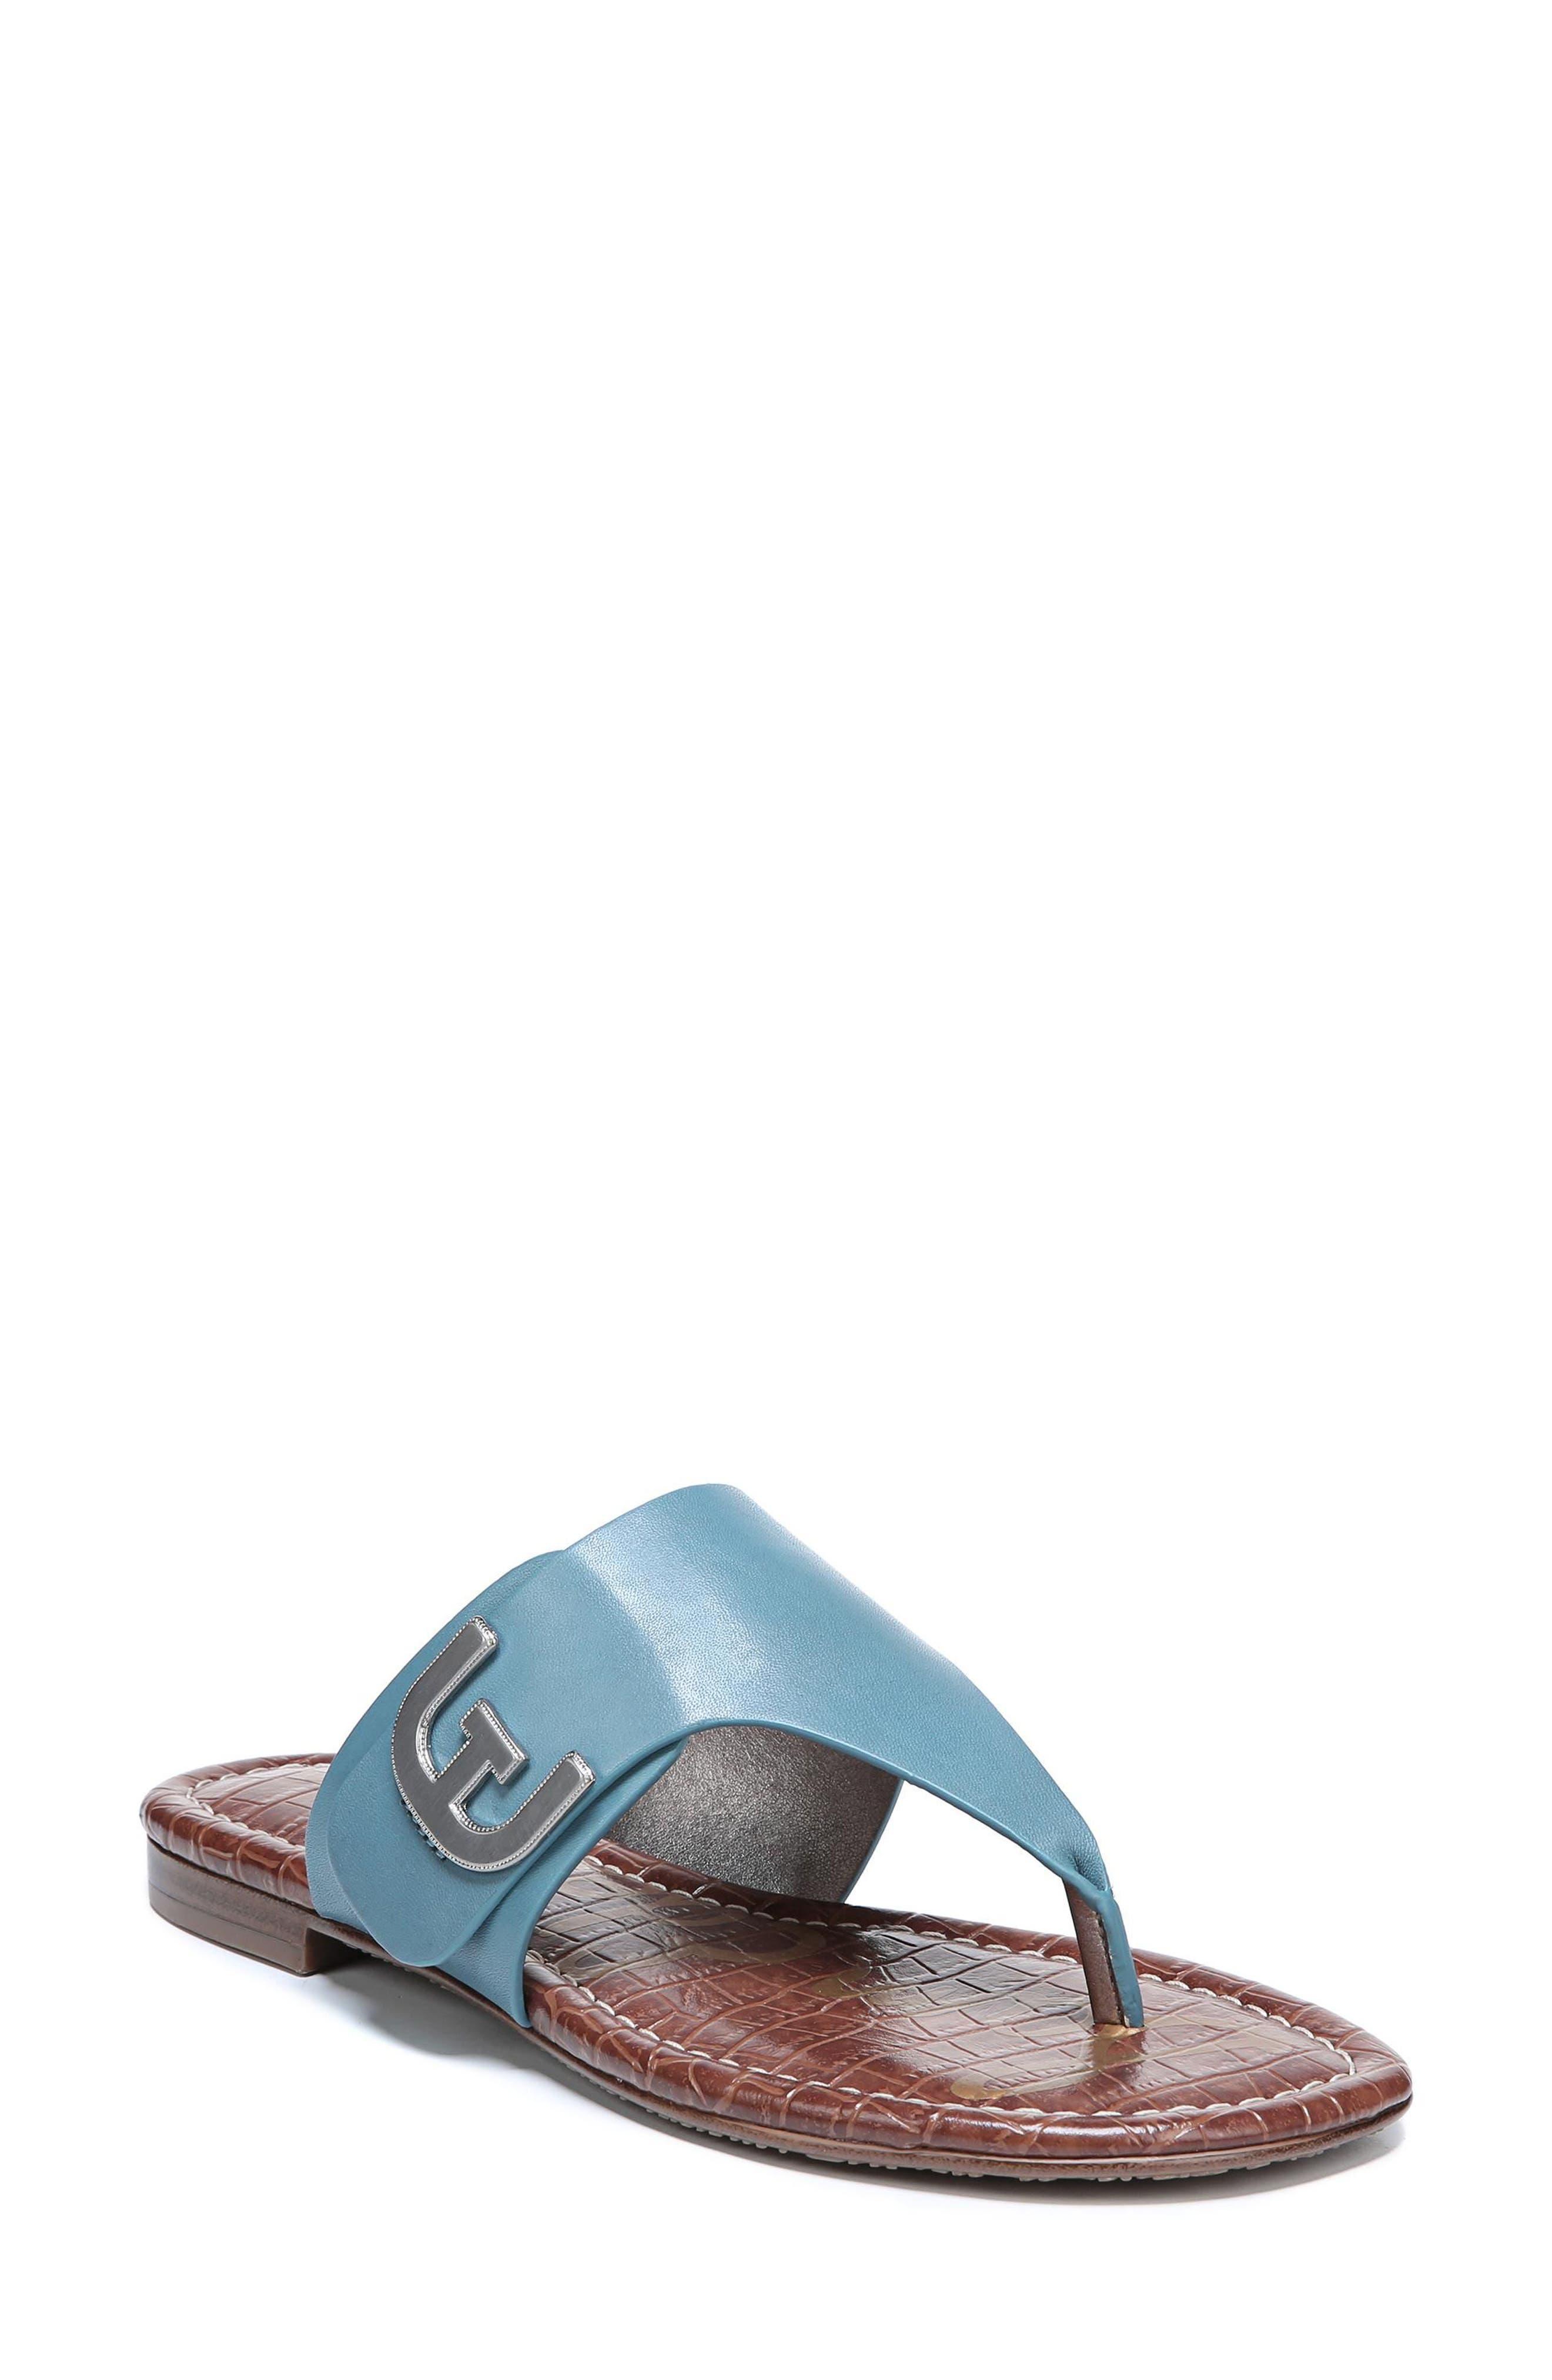 Barry V-Strap Thong Sandal,                             Main thumbnail 1, color,                             Denim Blue Leather